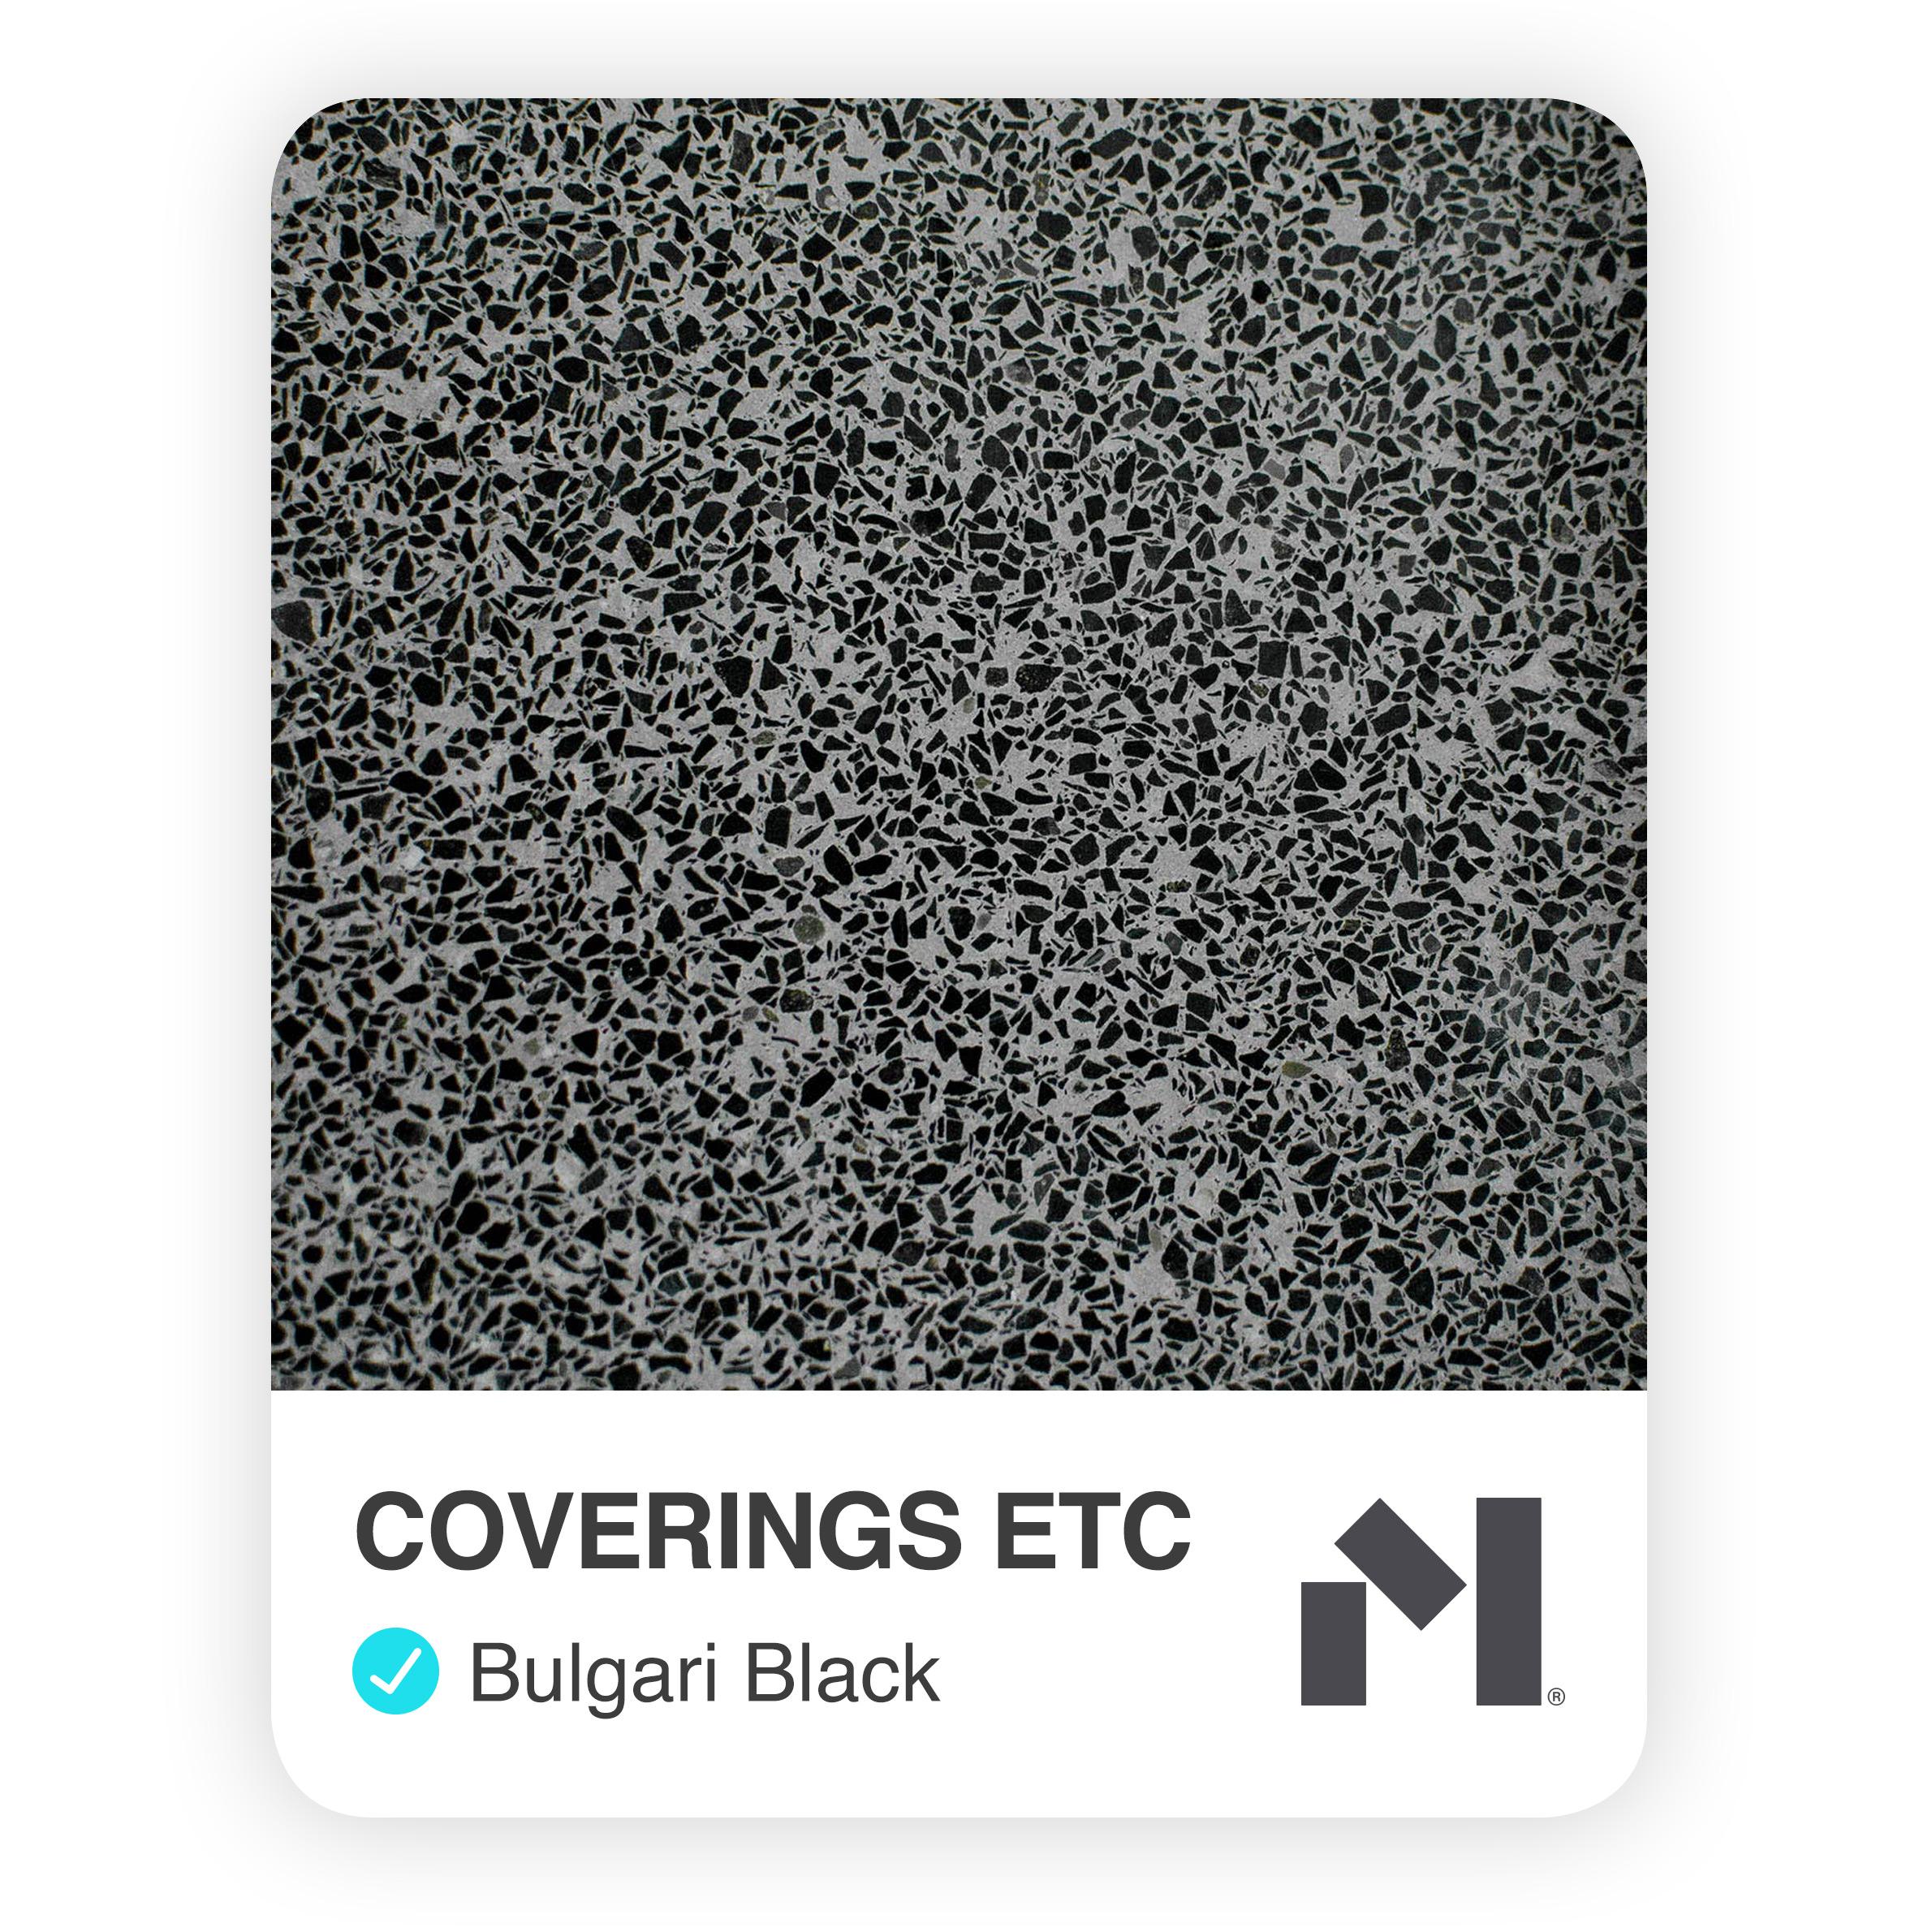 Bulgari Black